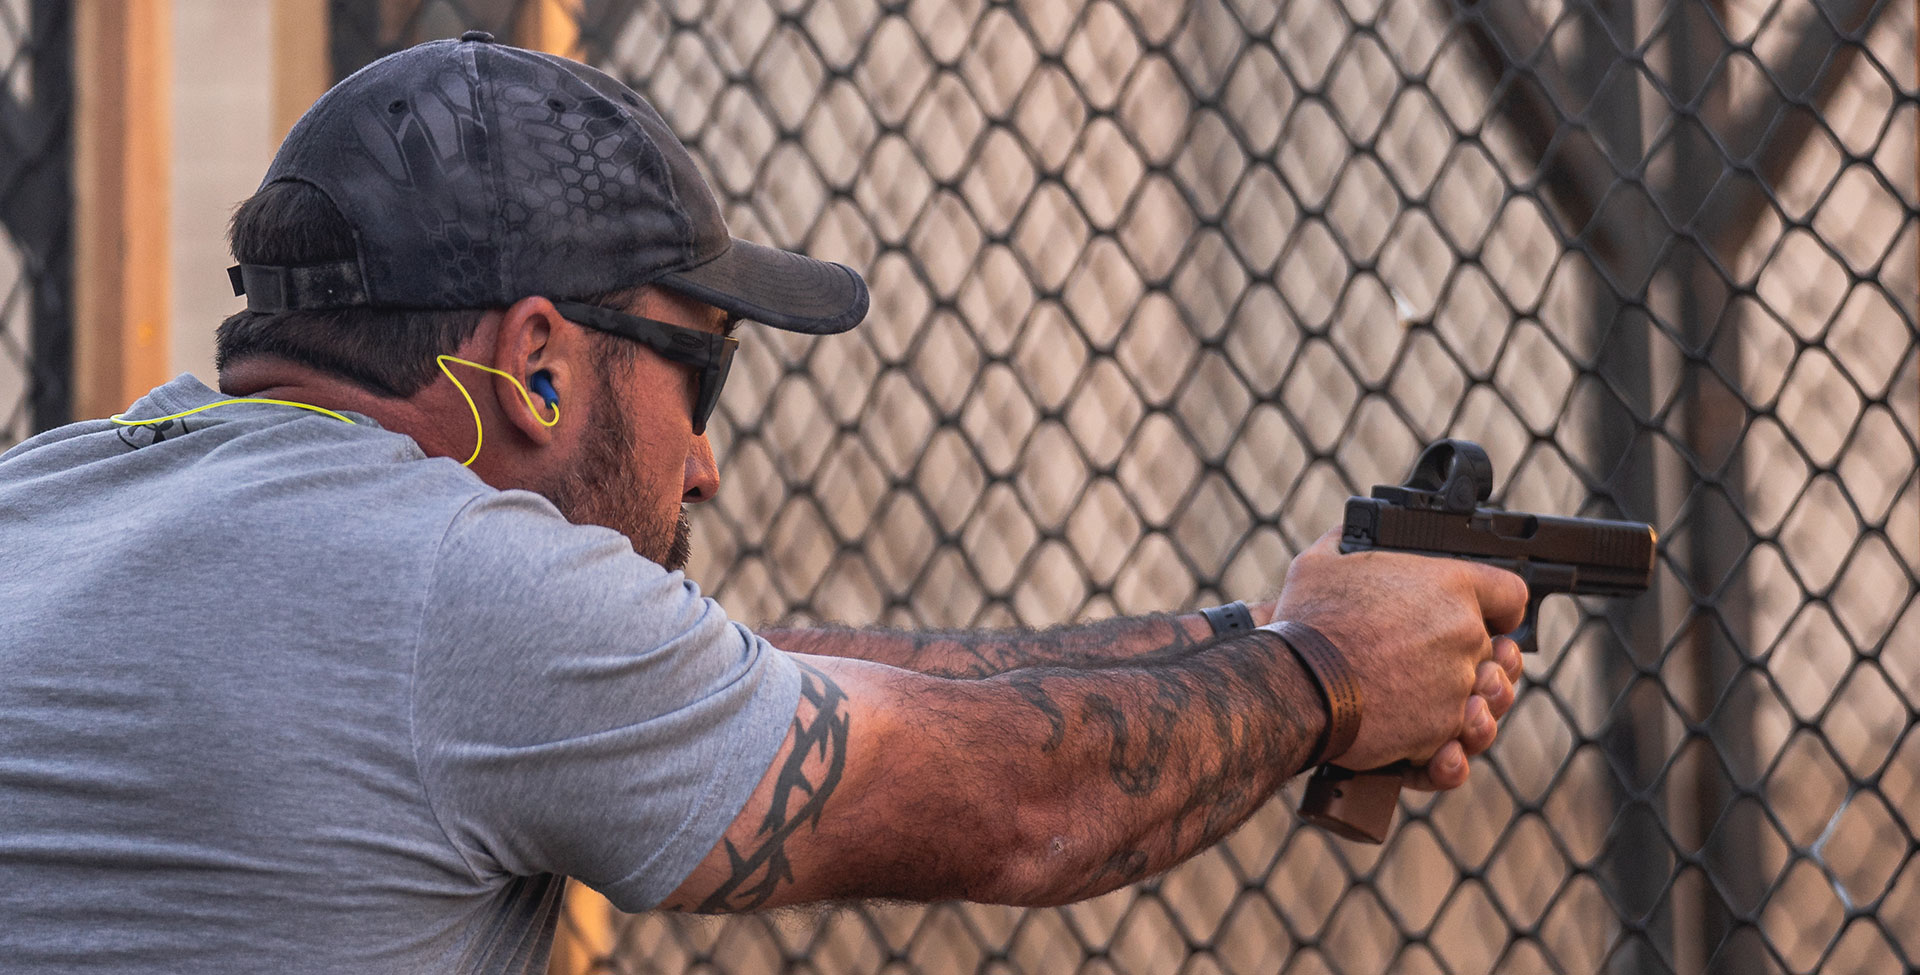 Matt Pranka encourages Practical Shooting for all shooters